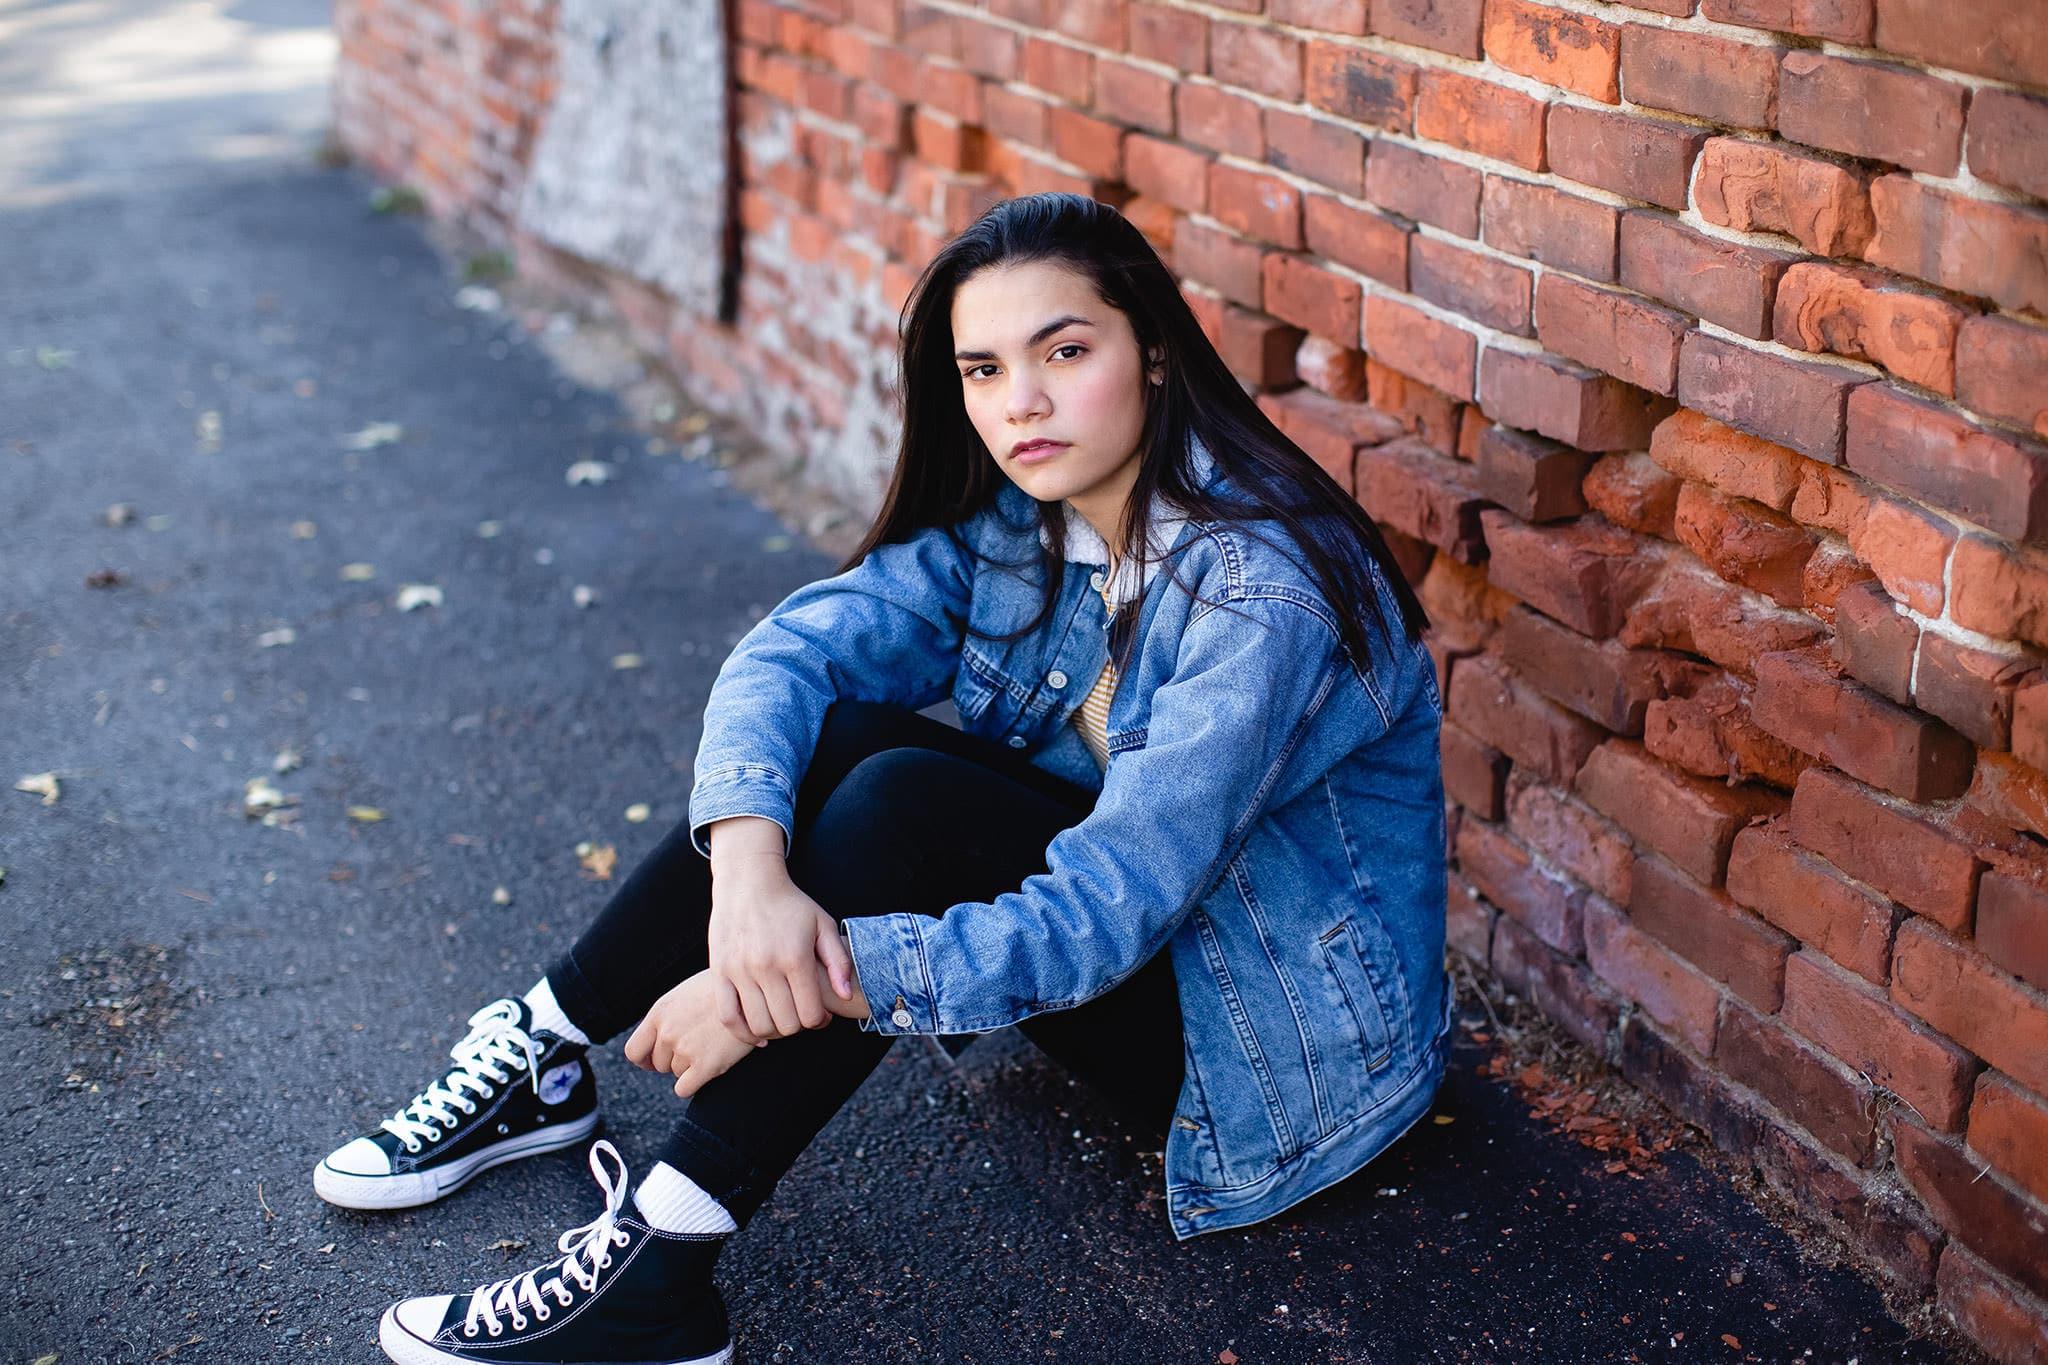 Syerra Fiery, Bethel High School, Senior pictures, Senior photography, Dayton, Ohio, Photographer, Dayton Inspires, Oregon District, Second Street Market